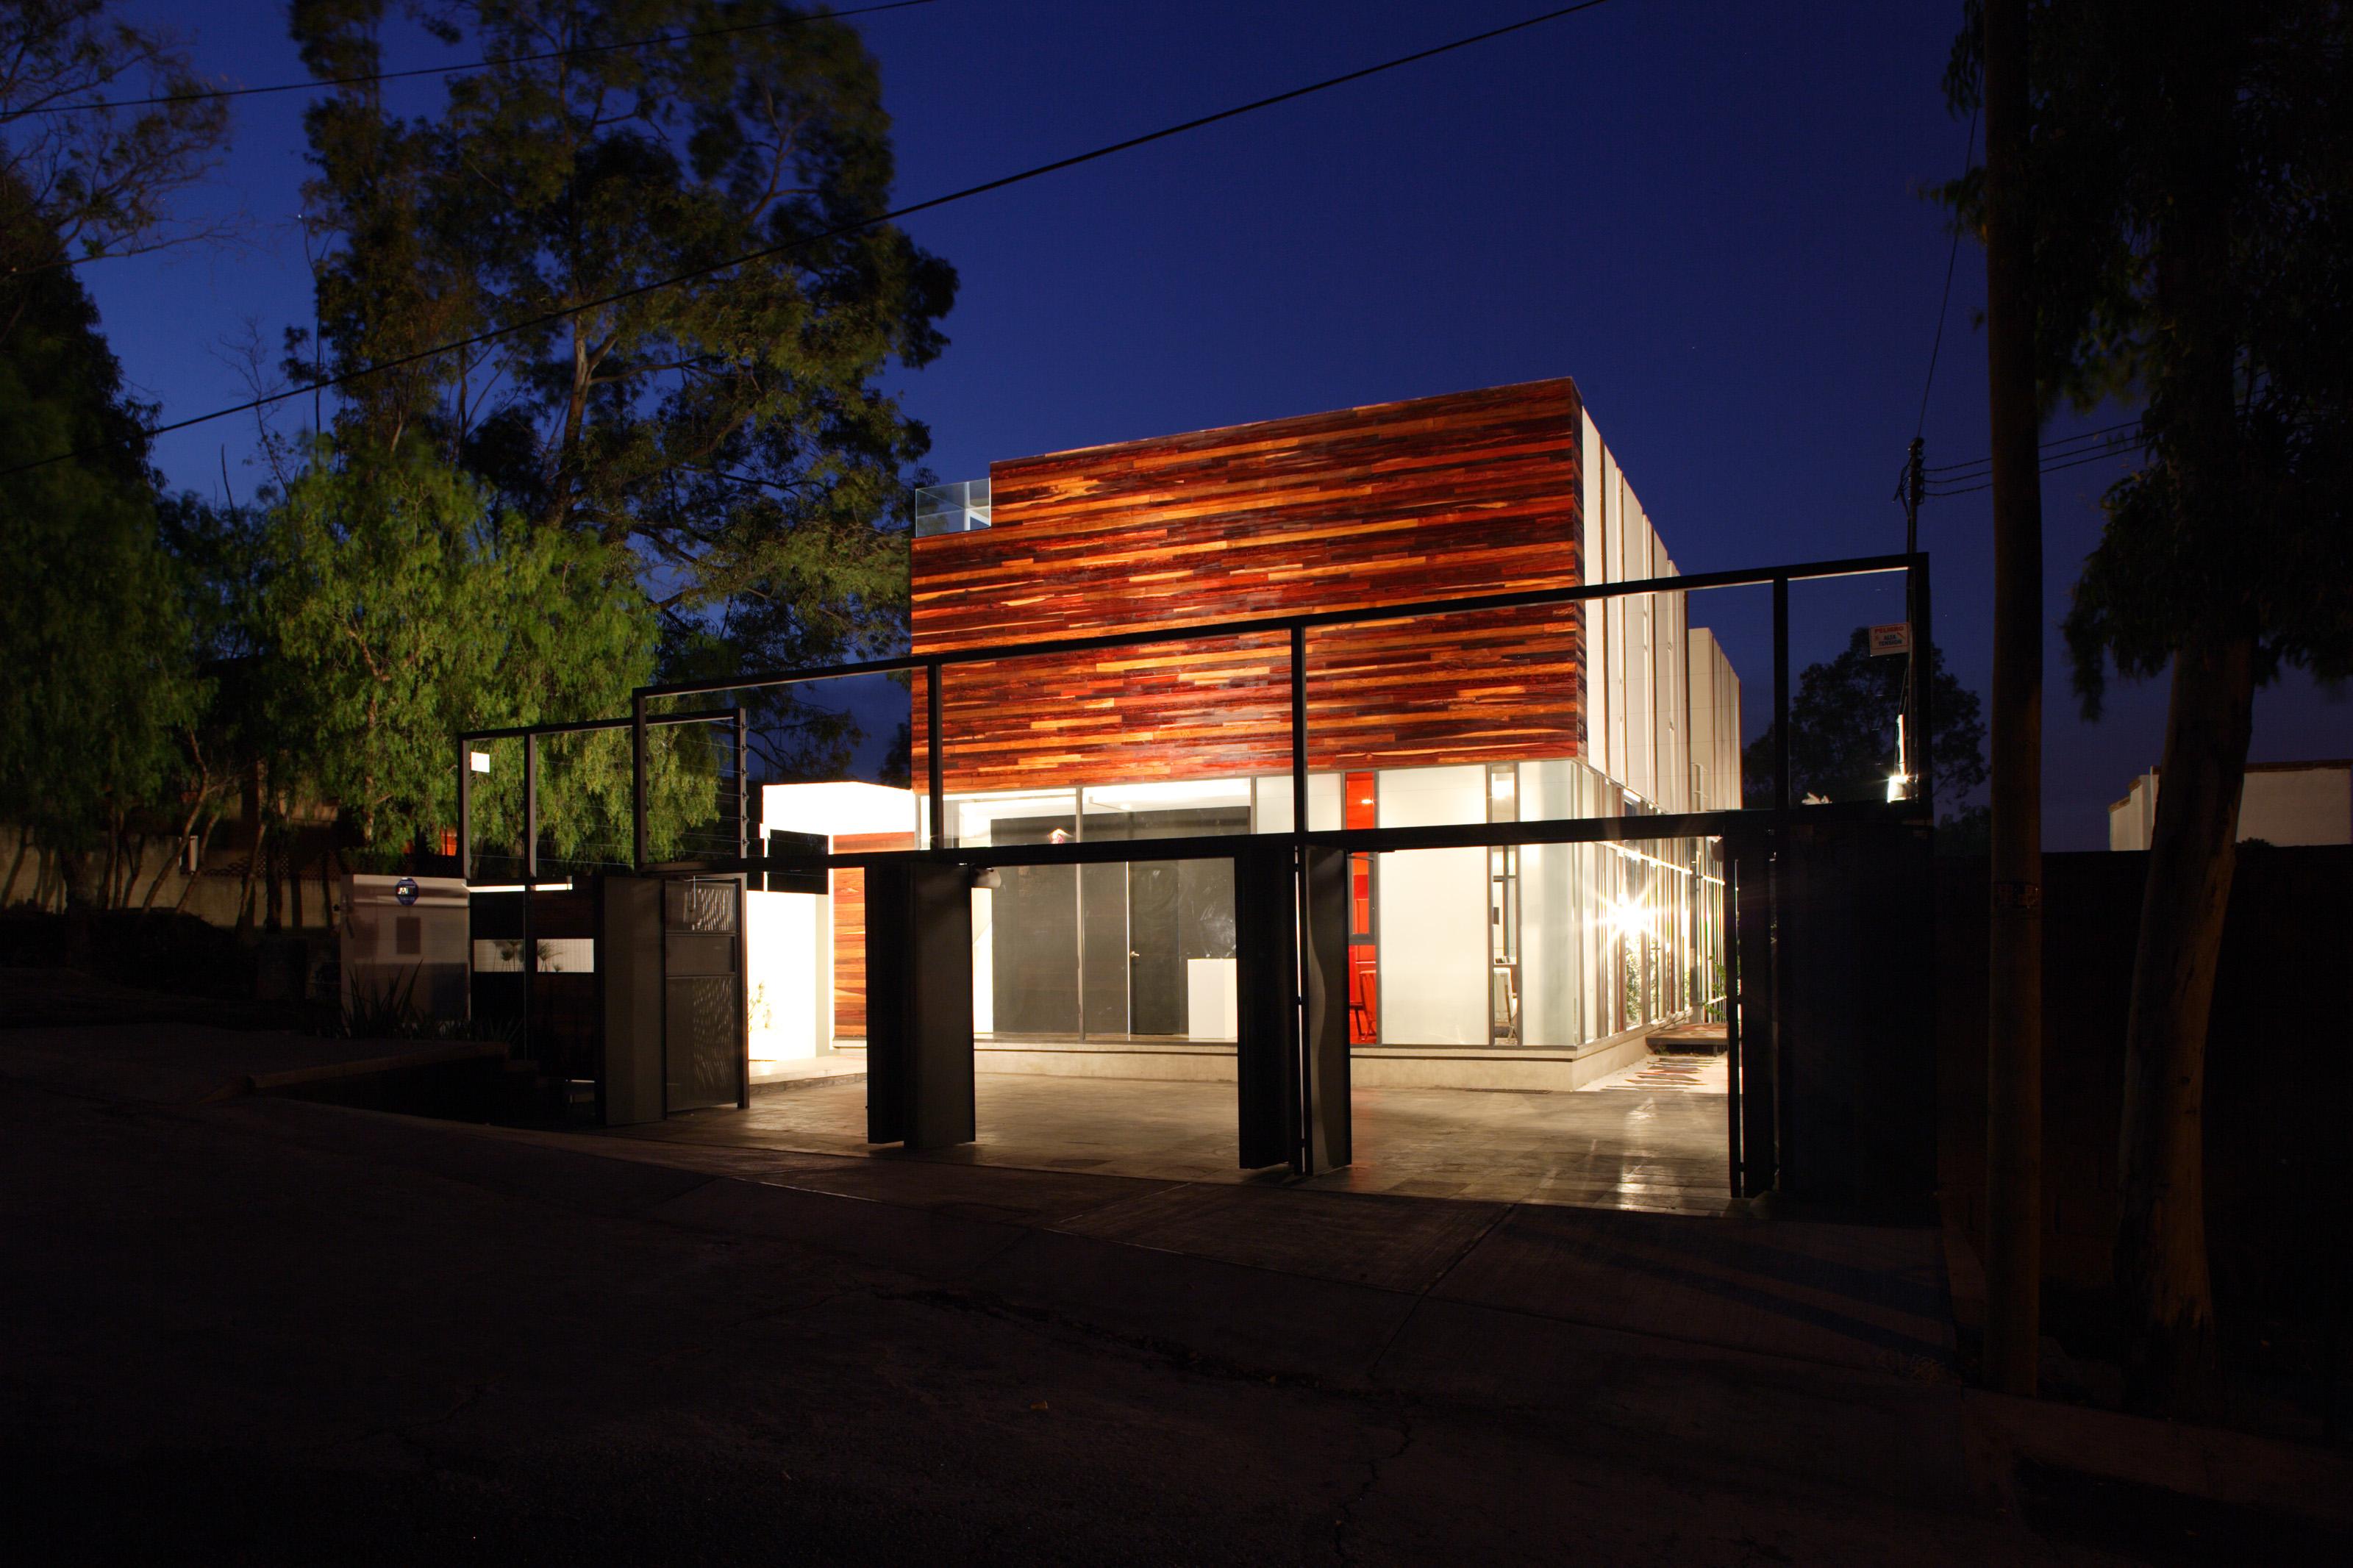 Casa del Lobo / Darkitectura, © Jorge Taboada